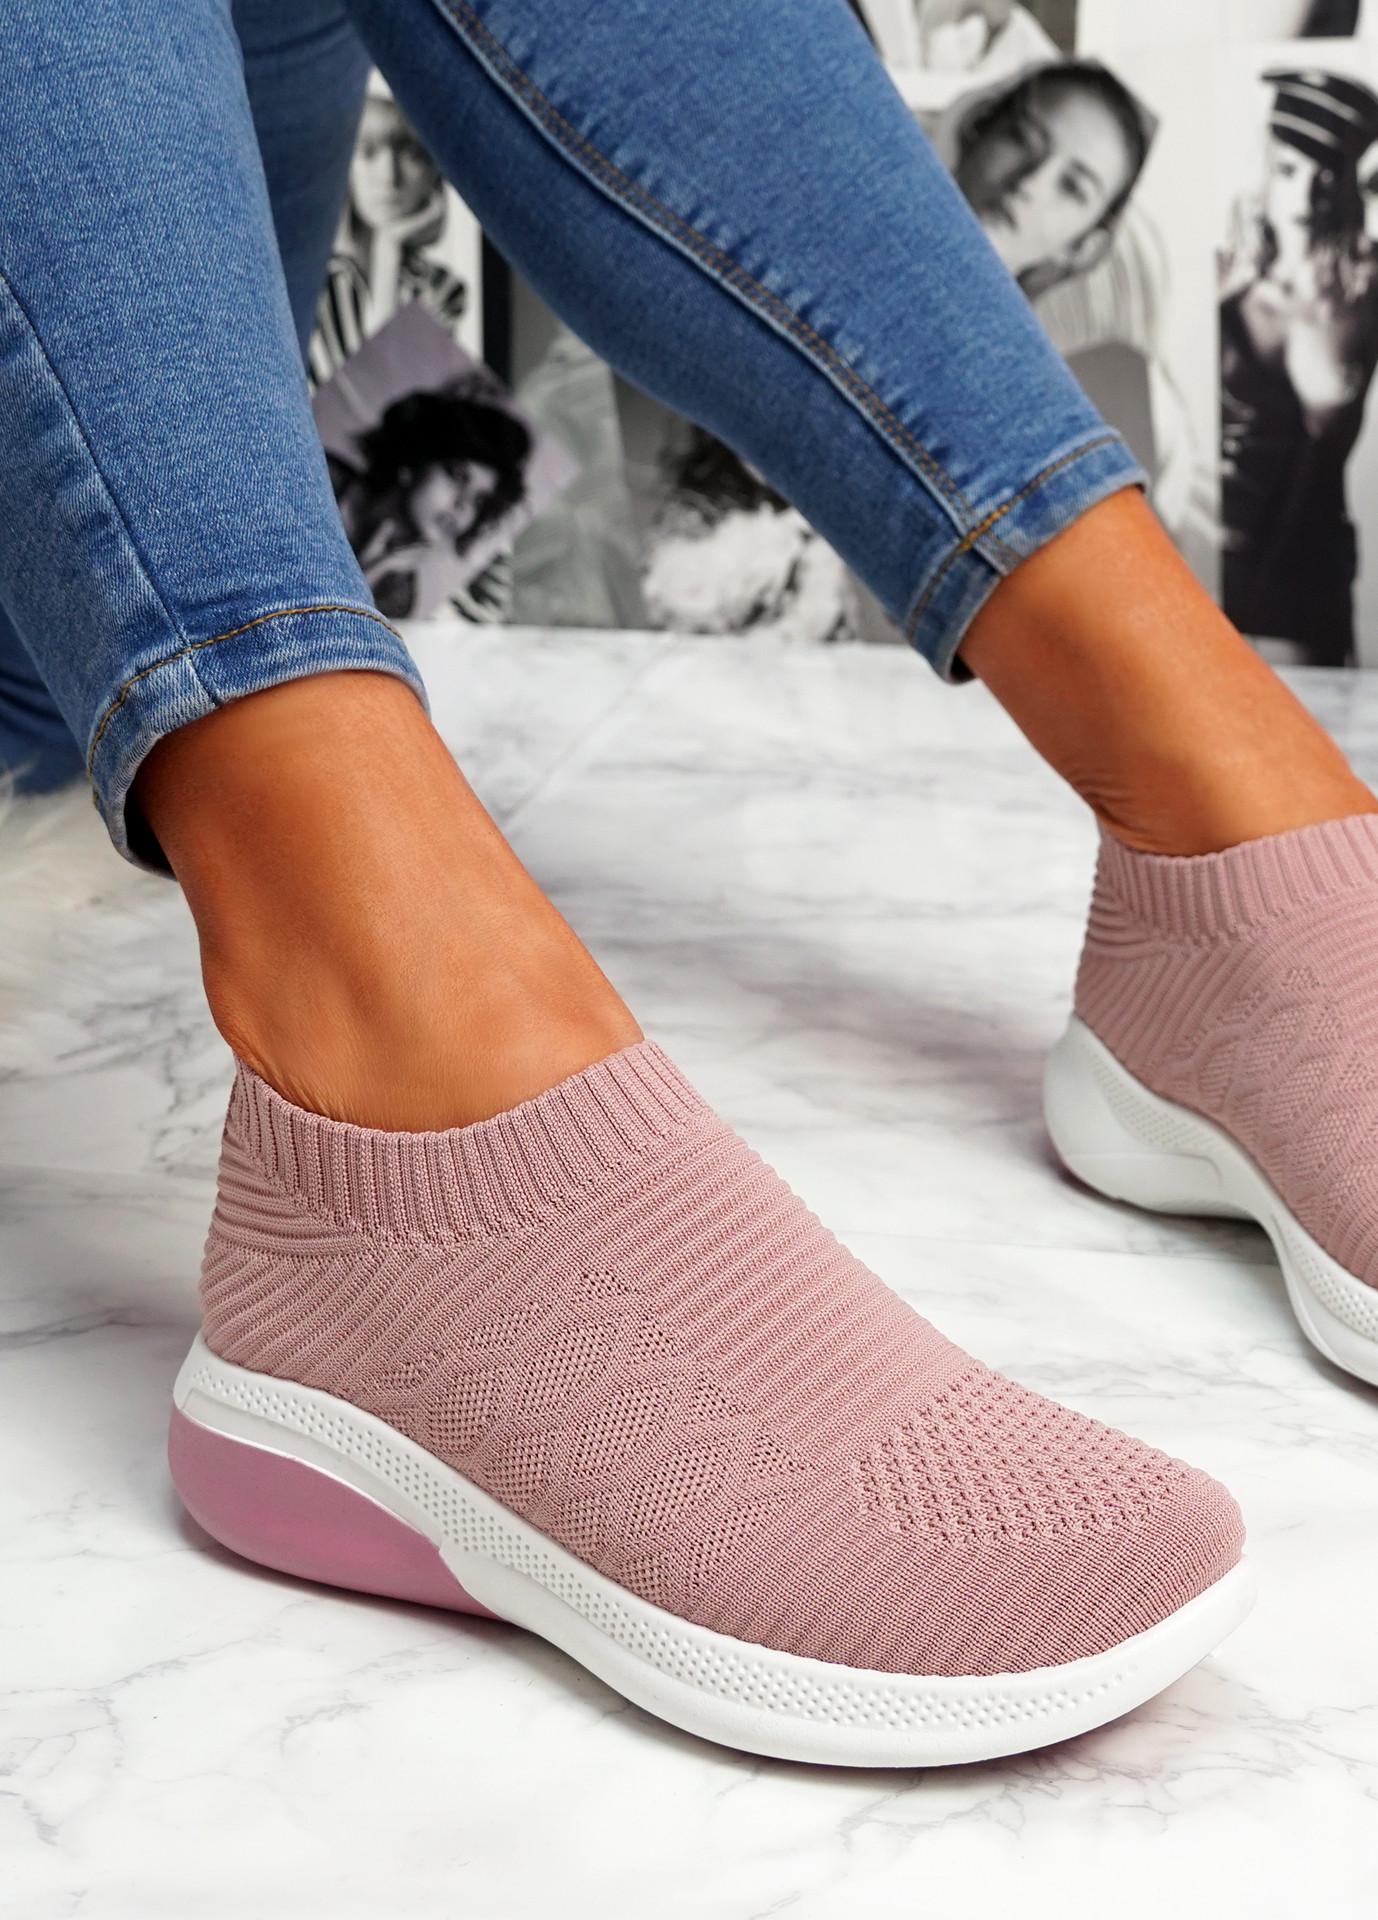 Muzy Pink Knit Slip On Trainers